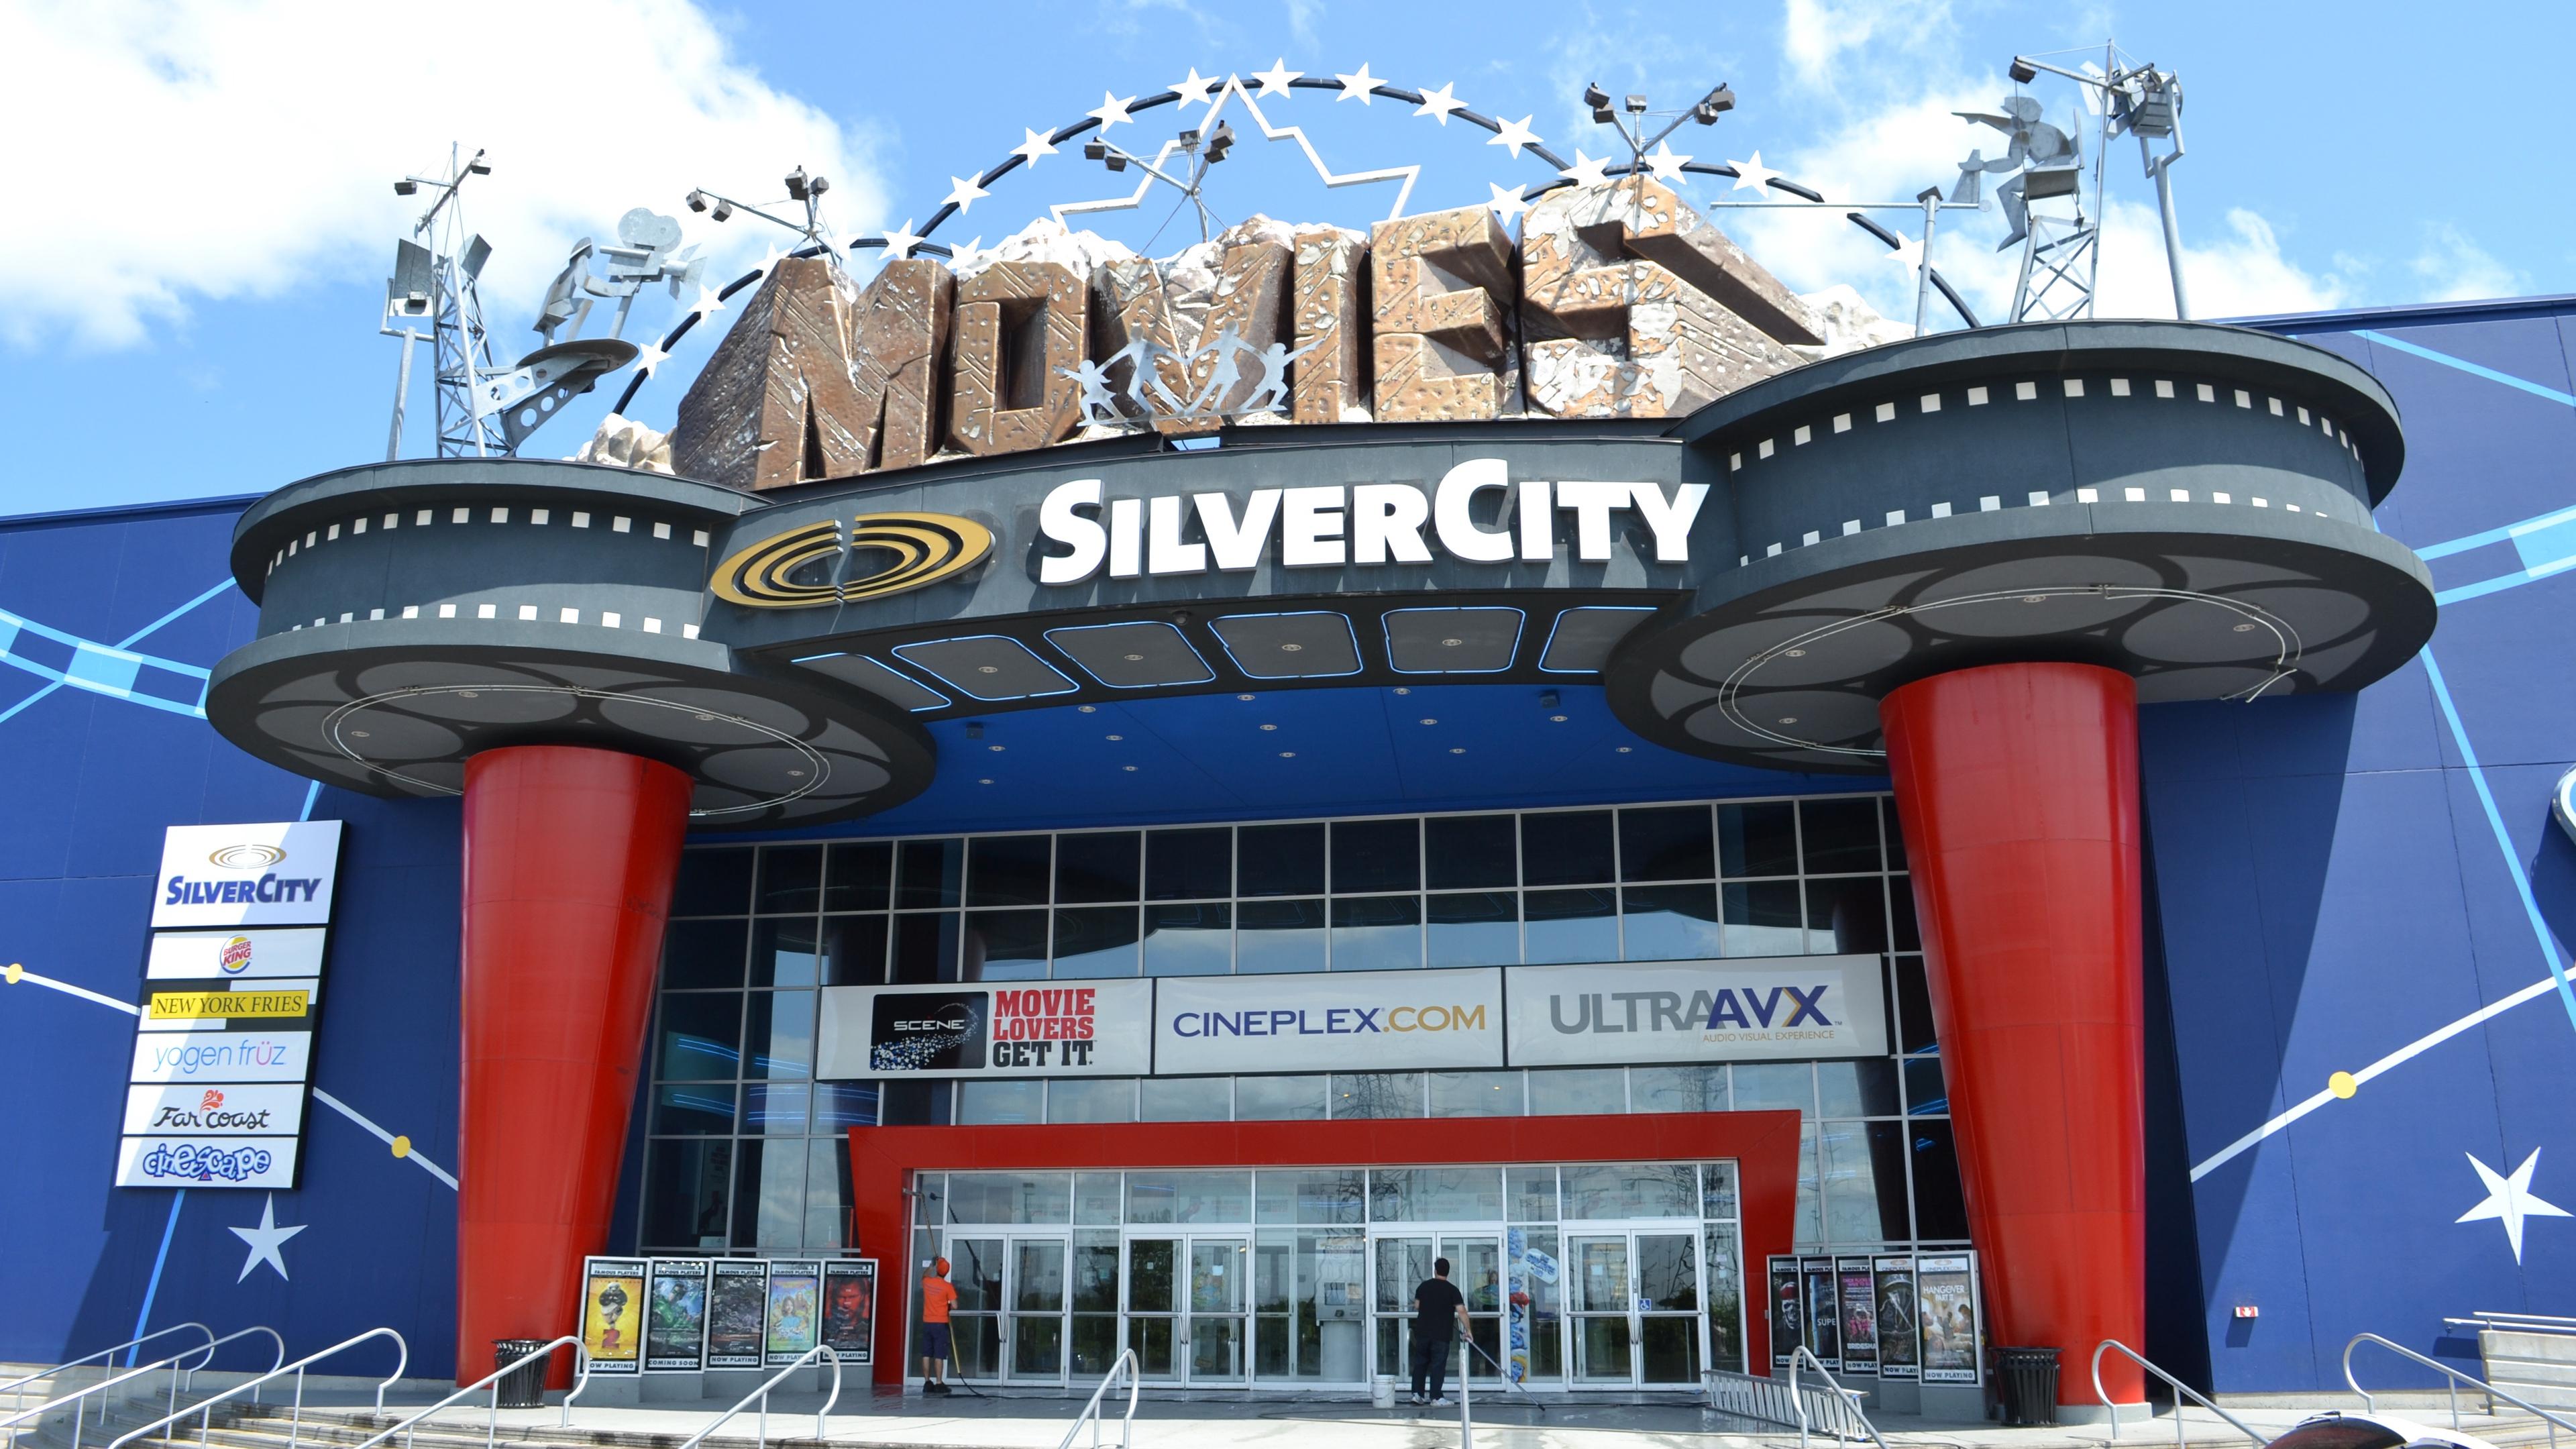 cineplex entertainment silver city new mexico 4k 1538064769 - cineplex entertainment, silver city, new mexico 4k - silver city, new mexico, cineplex entertainment